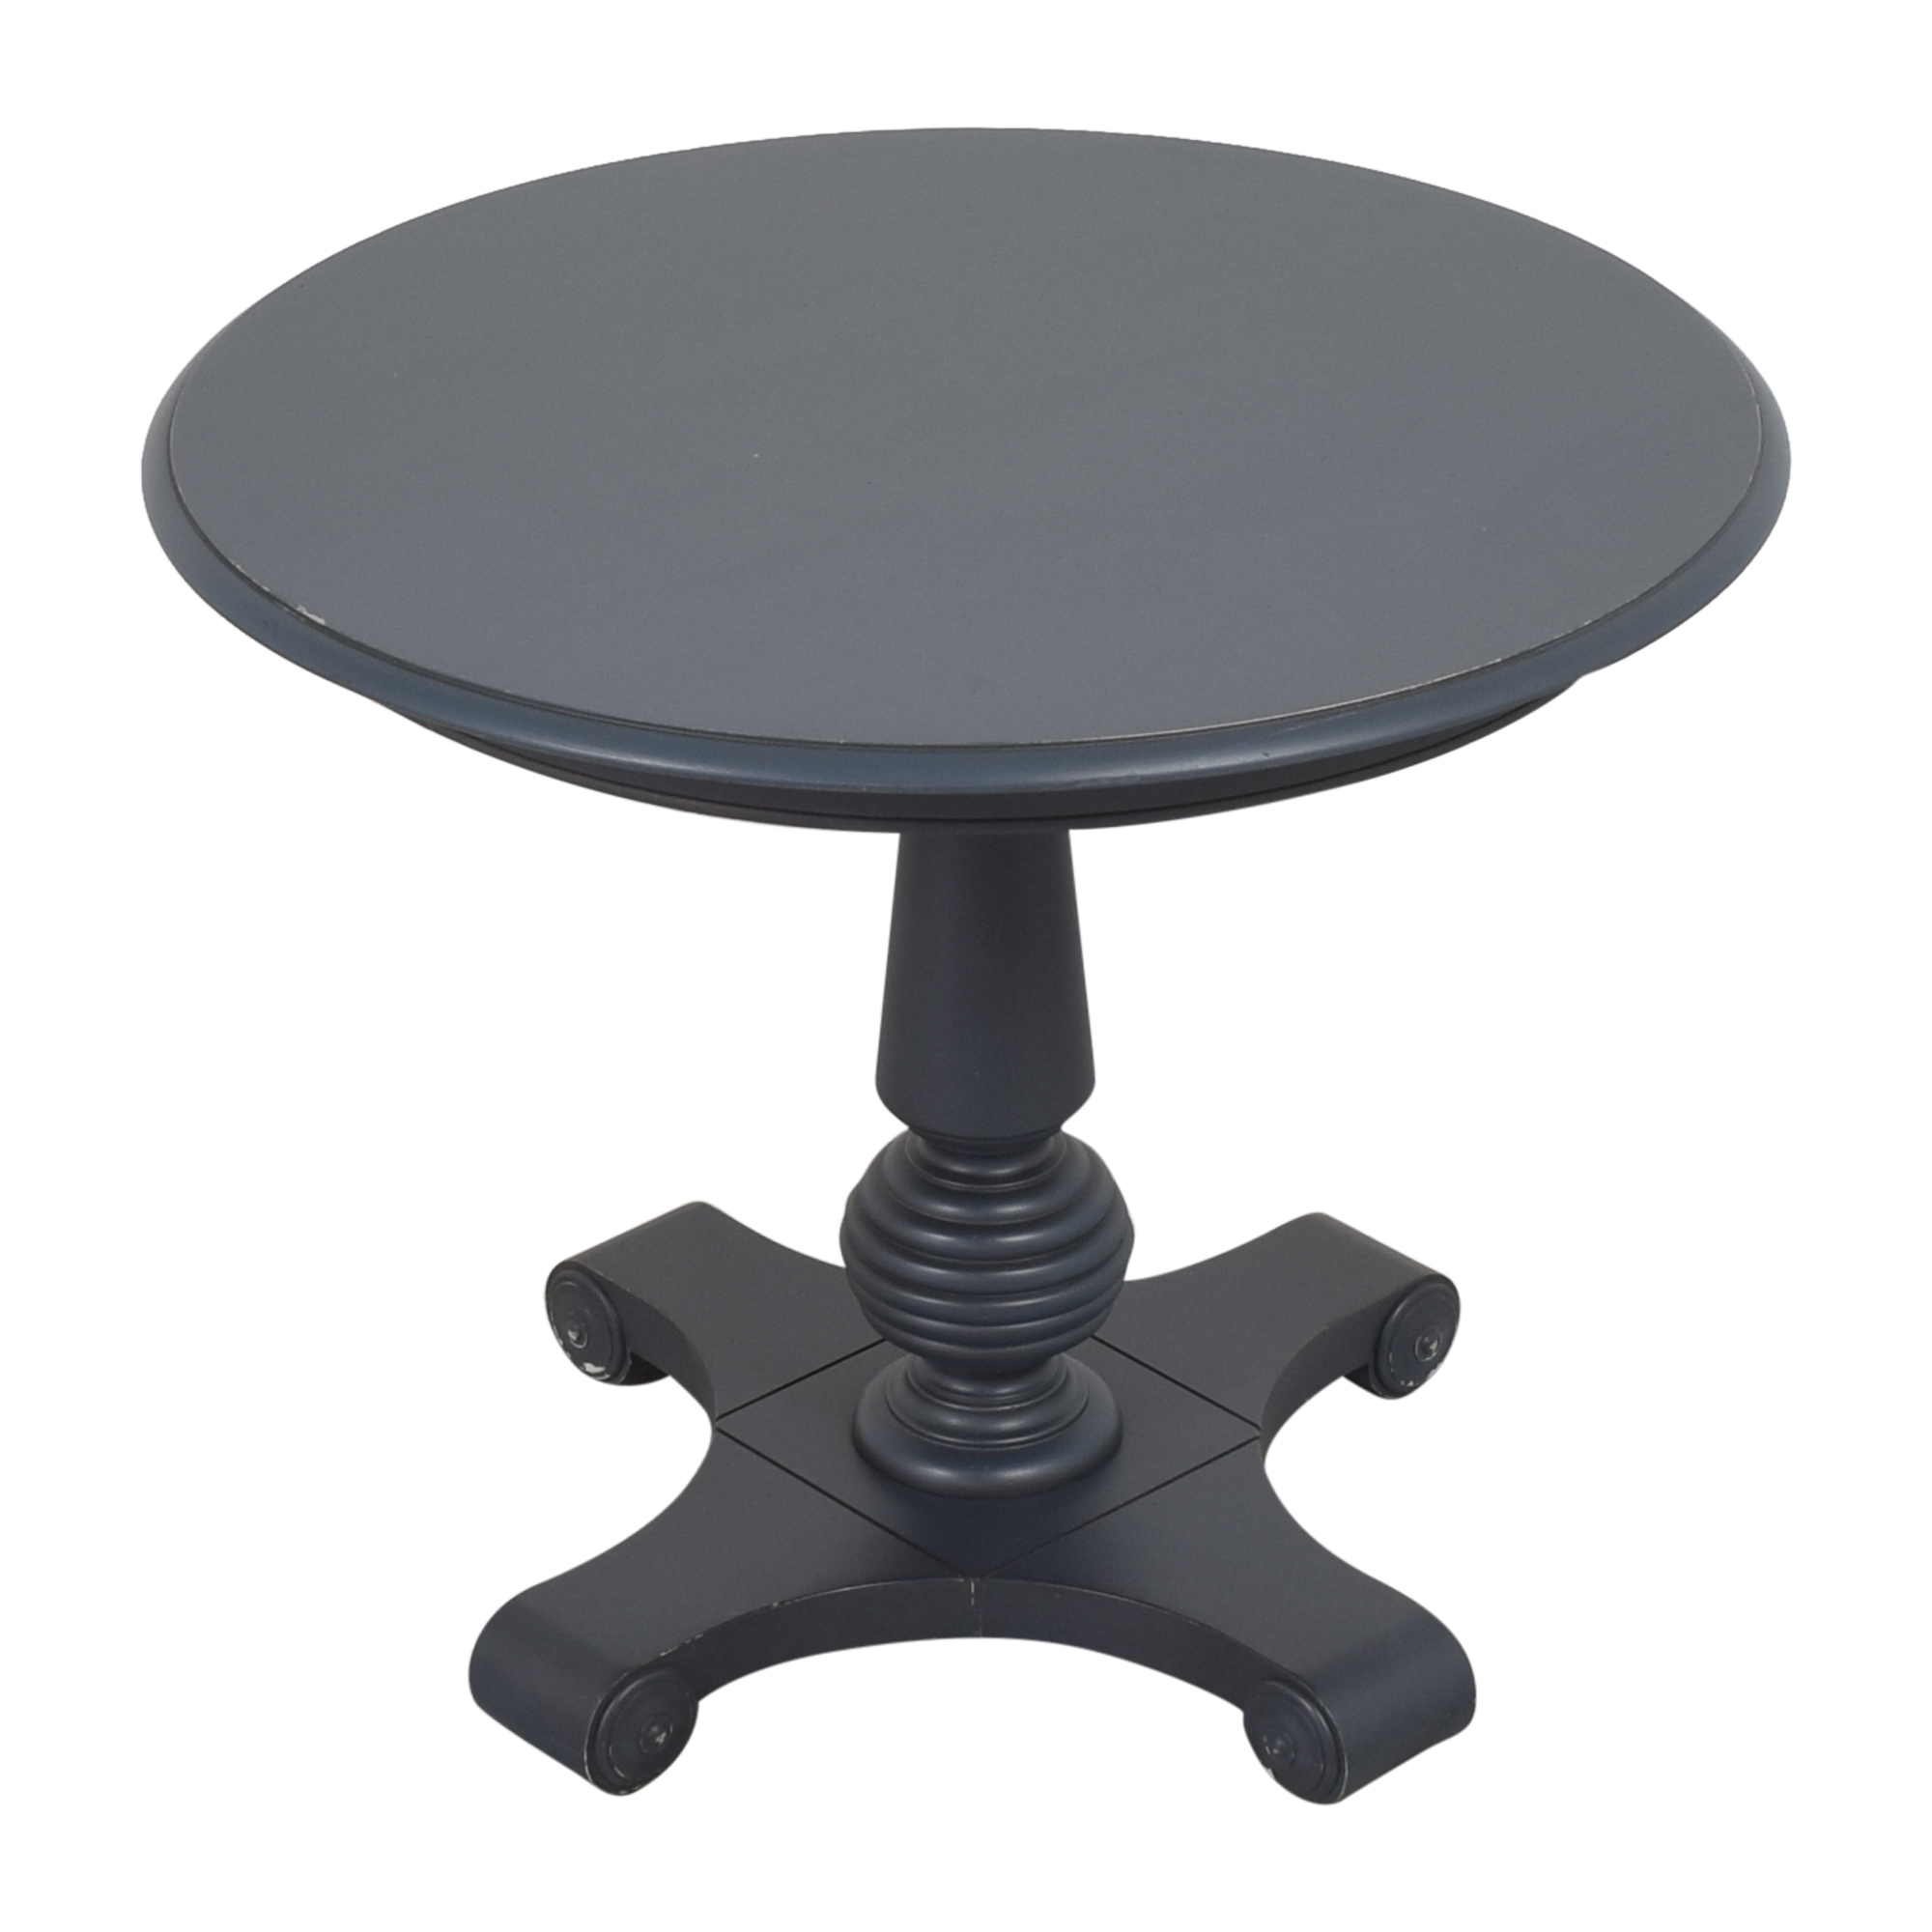 Ethan Allen Tanner Pedestal Table Ethan Allen